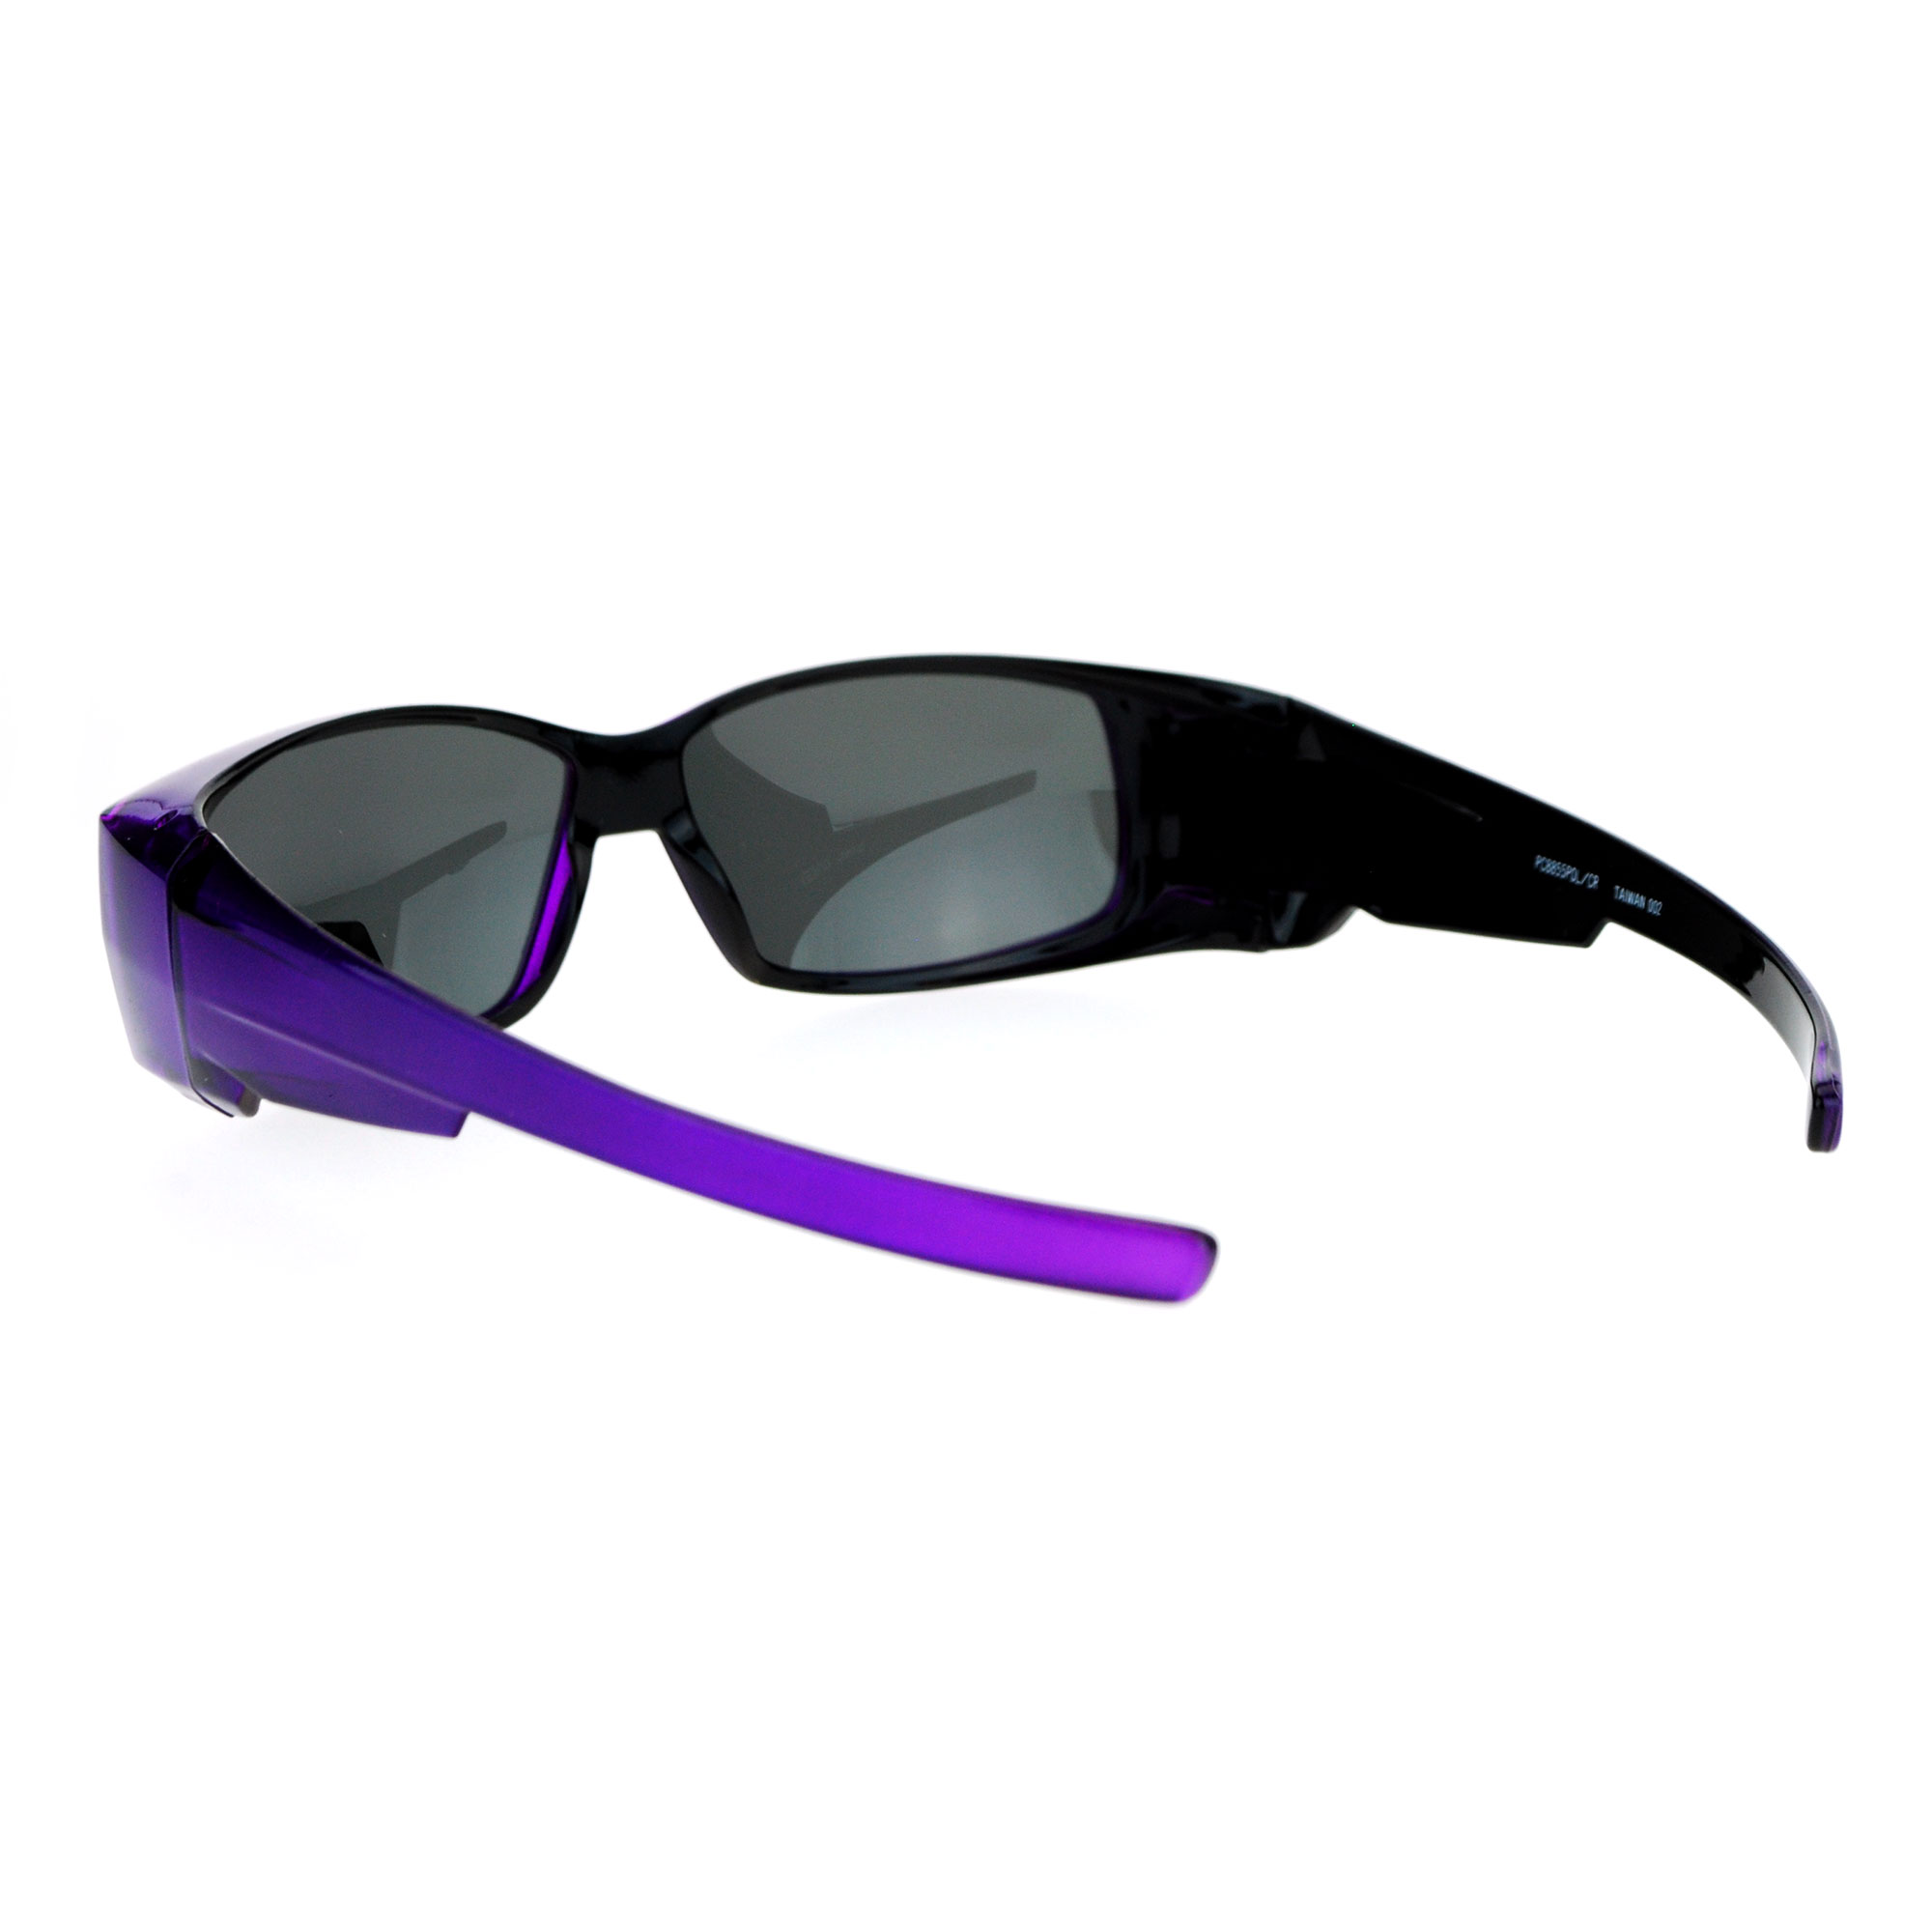 d109e7f1daf1 SA106 - SA106 Unisex Polarized Rectangular 55mm Over the Glasses Fit Over  Sunglasses Red - Walmart.com